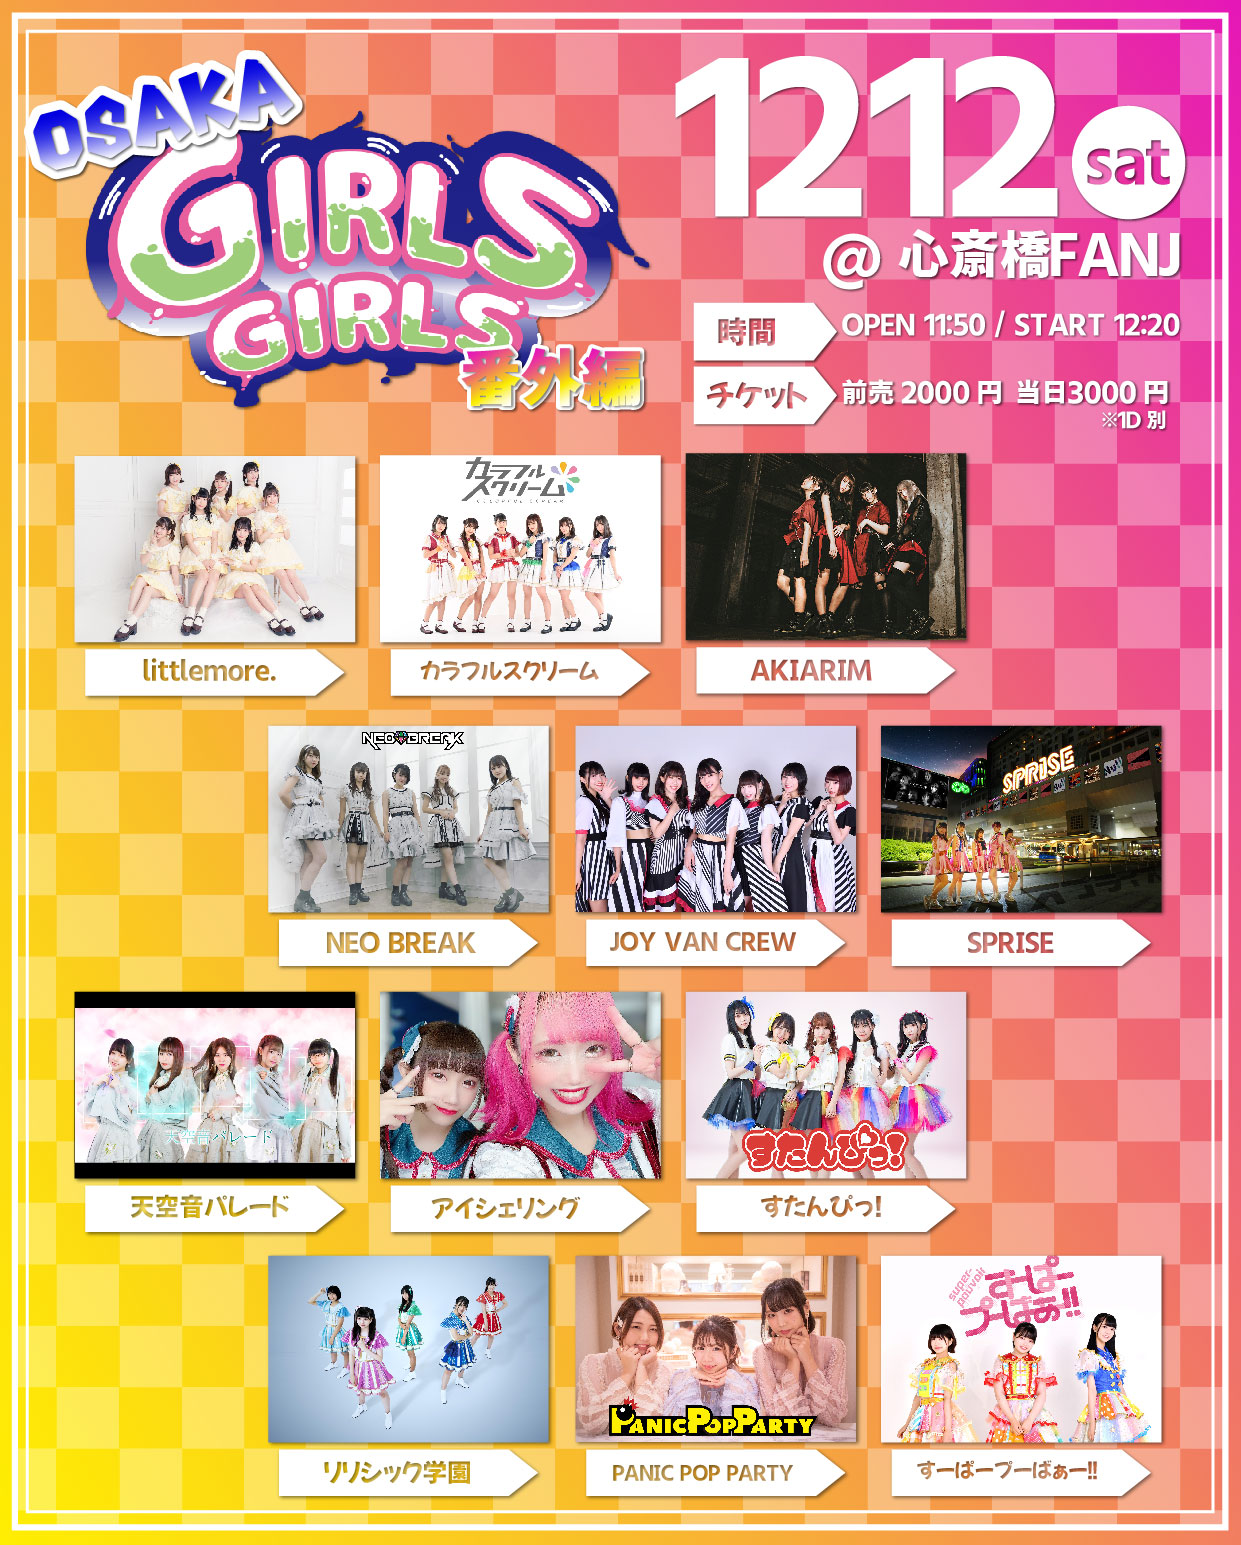 12/12(土) OSAKA GIRLS GIRLS 番外編